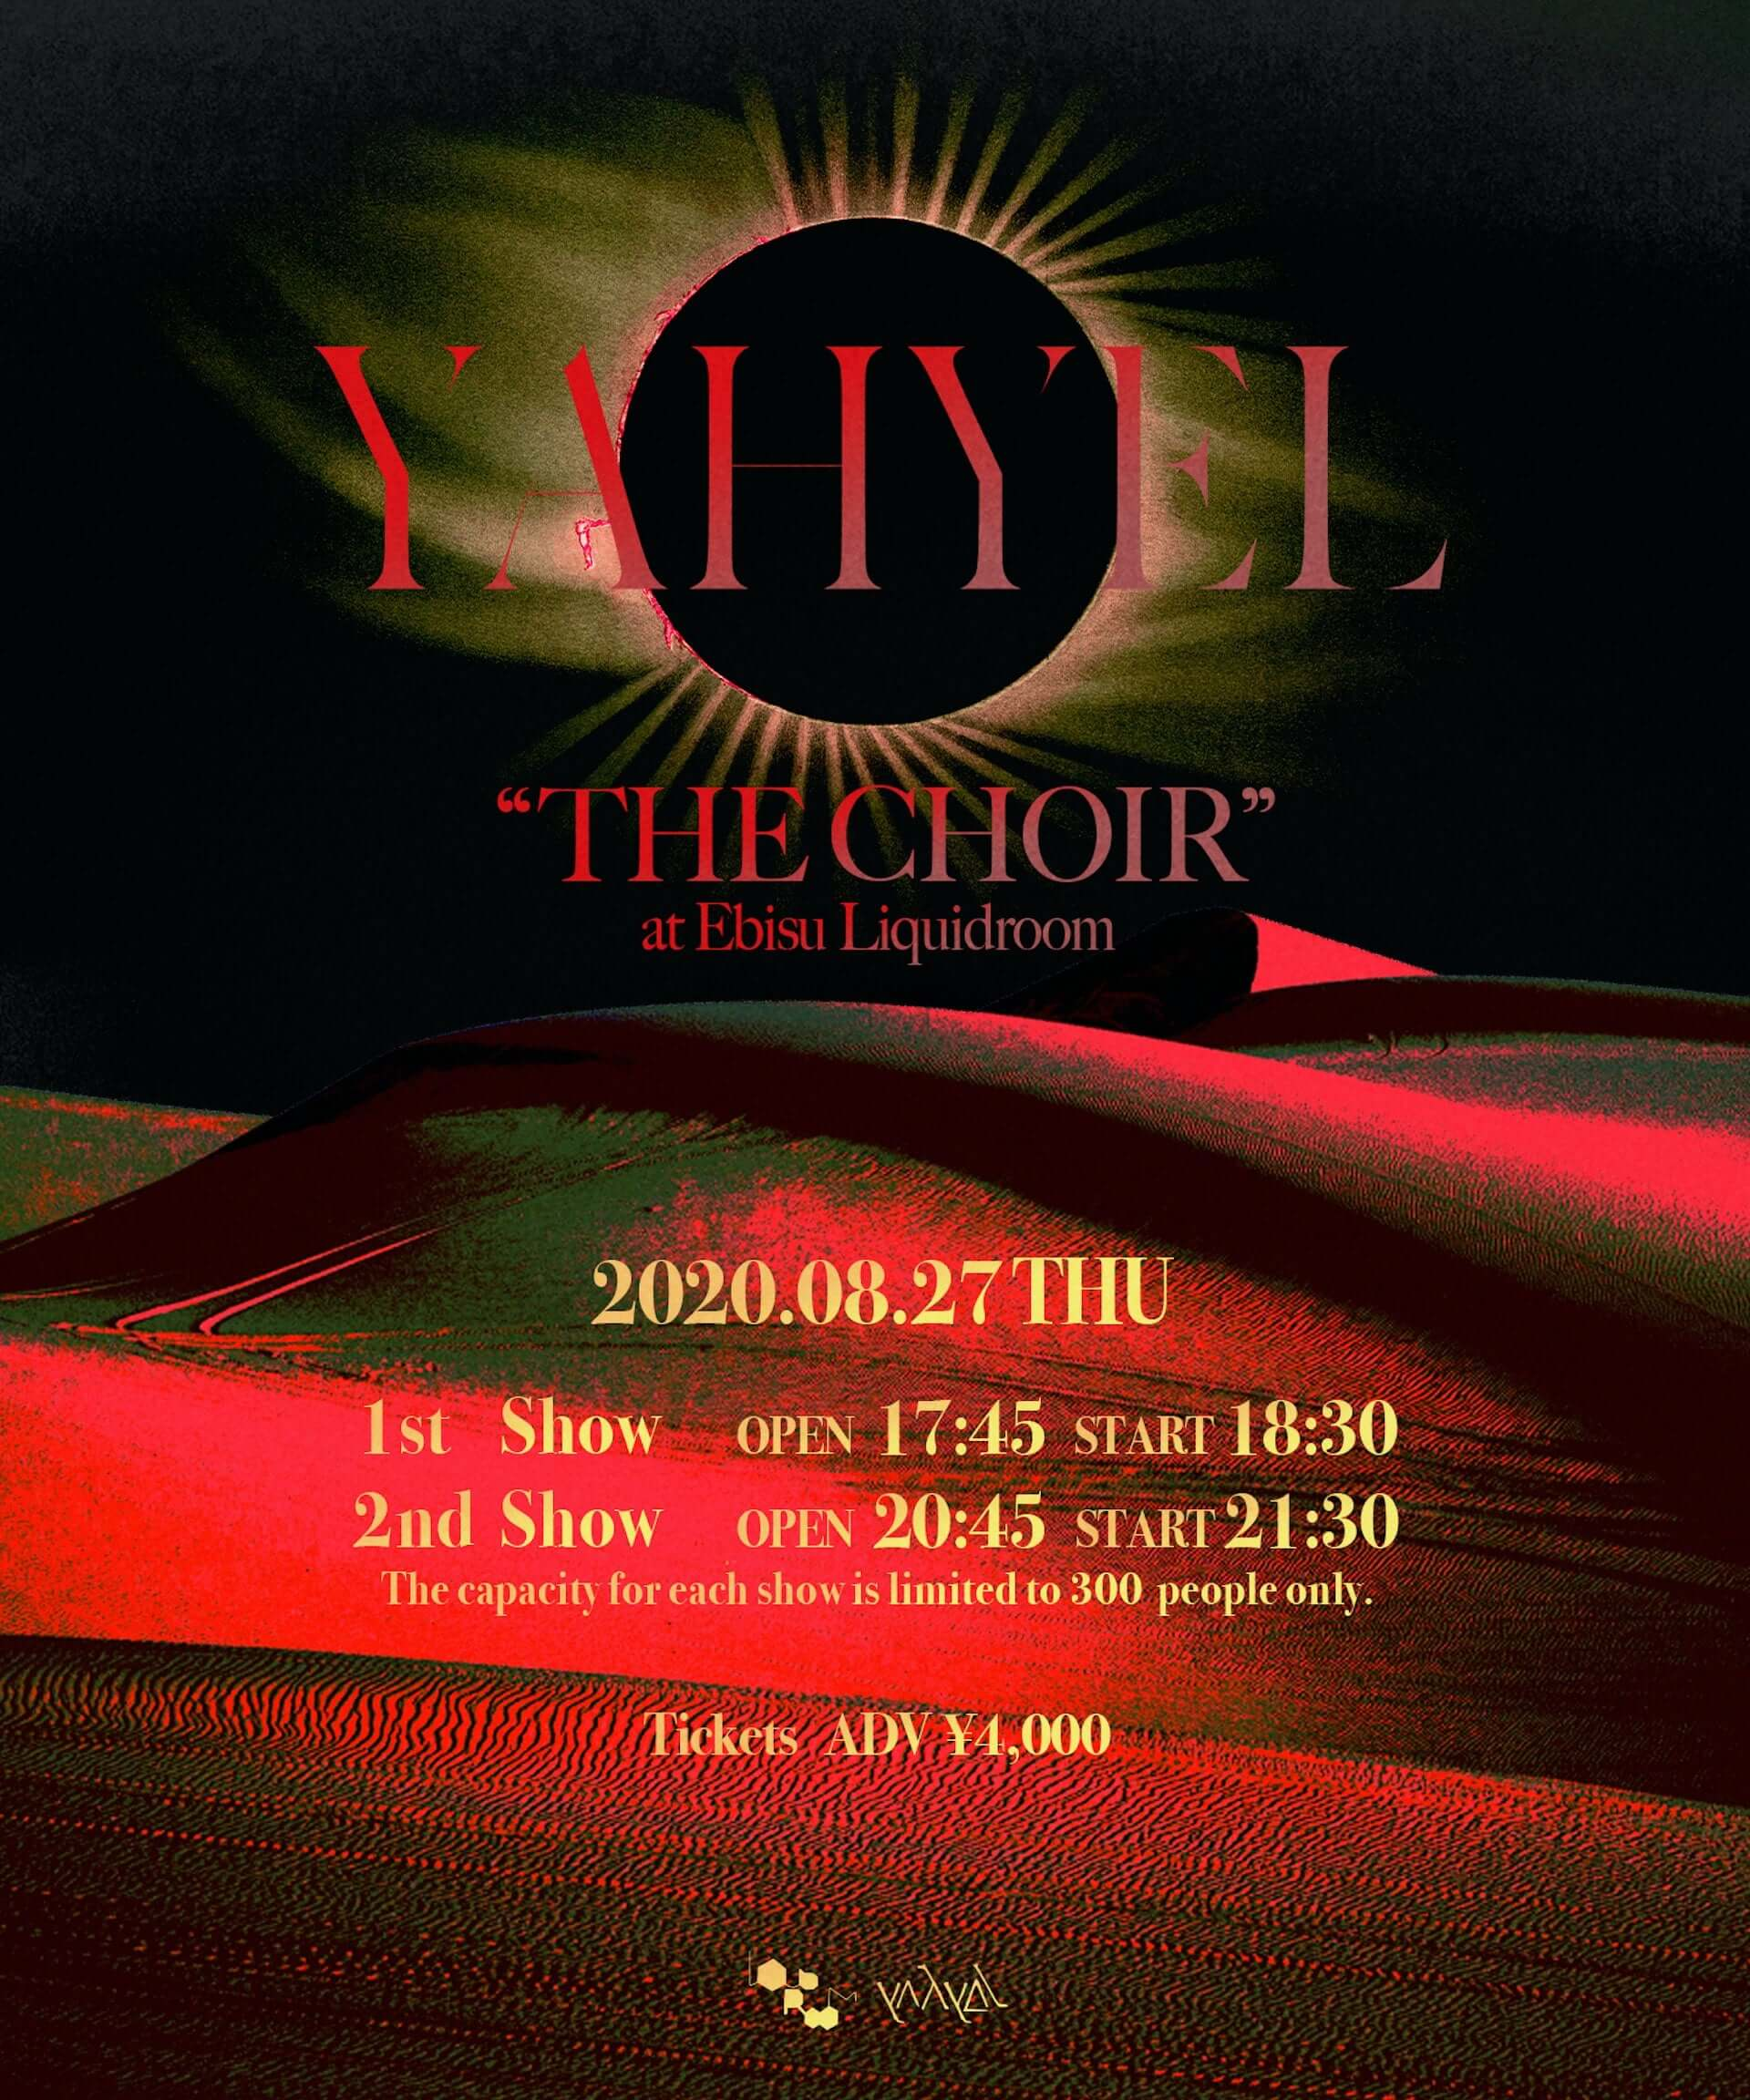 yahyelが約2年ぶりのワンマンライブをLIQUIDROOMにて無観客で開催決定!当日のメンバーを計600名募集 music200720_yahyel_3-1920x2304